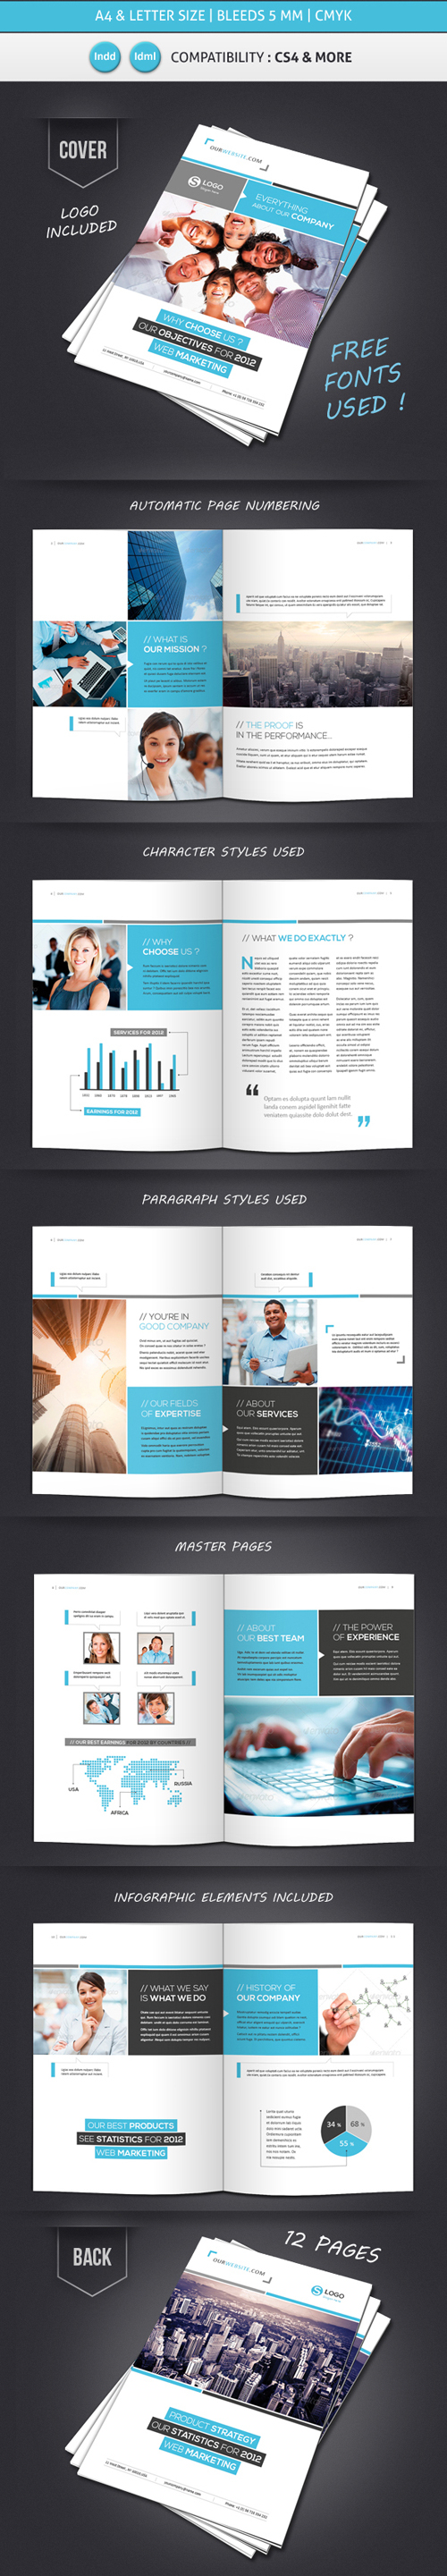 Professional Brochure Designs | Design | Graphic Design Junction Inside 12 Page Brochure Template